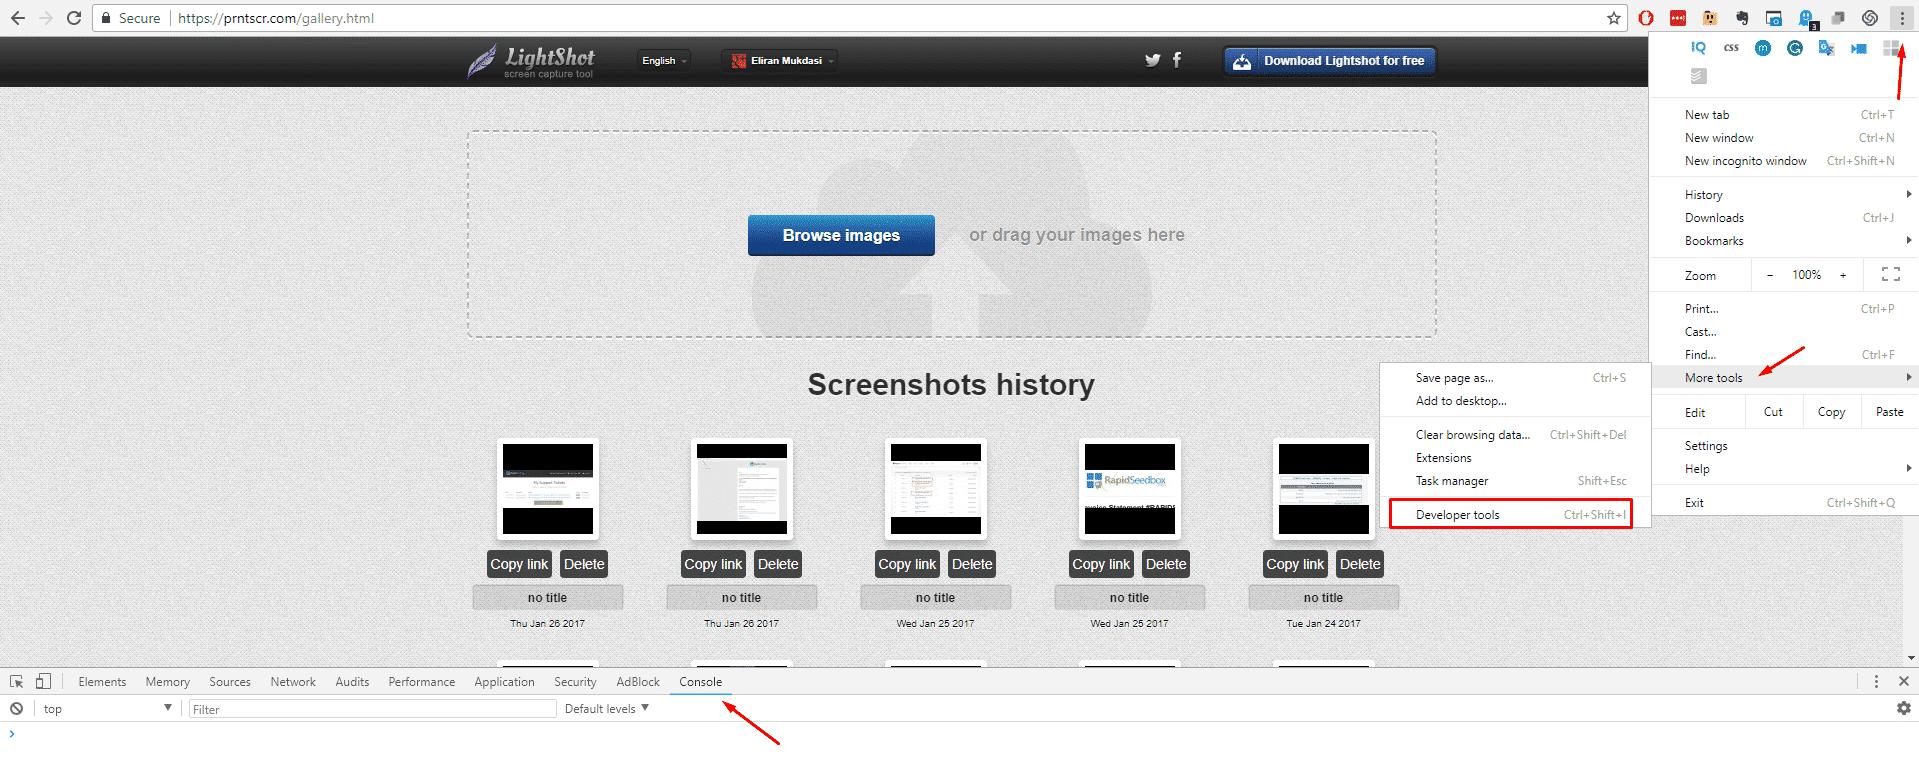 how to delete a lightshot image